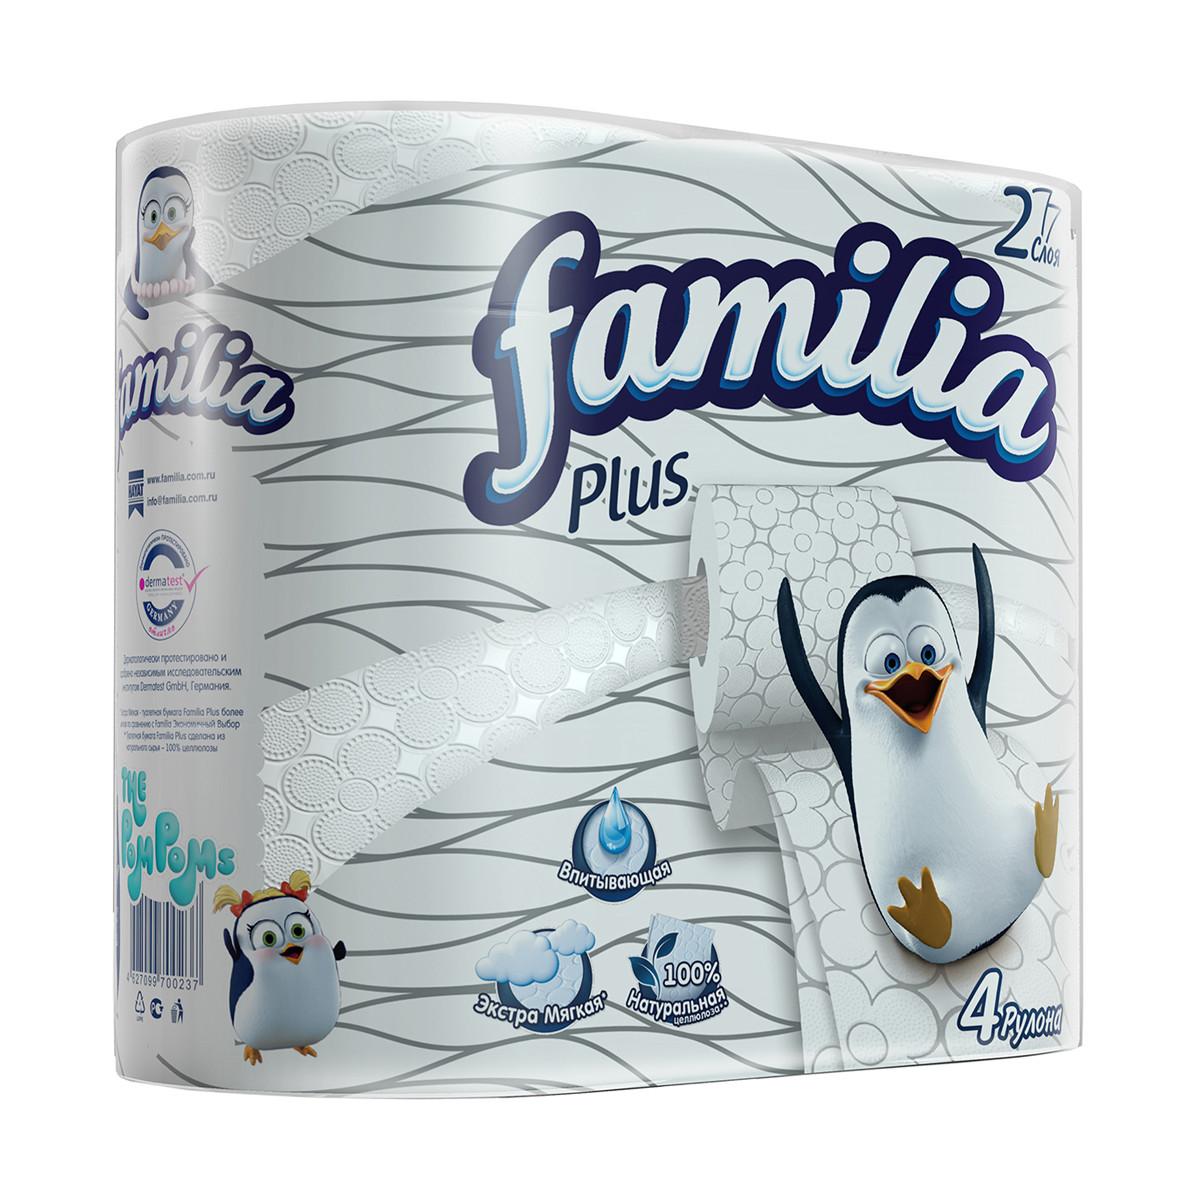 Туалетная бумага Фамилиа - Familia Plus белая 2сл 4шт/упаковка